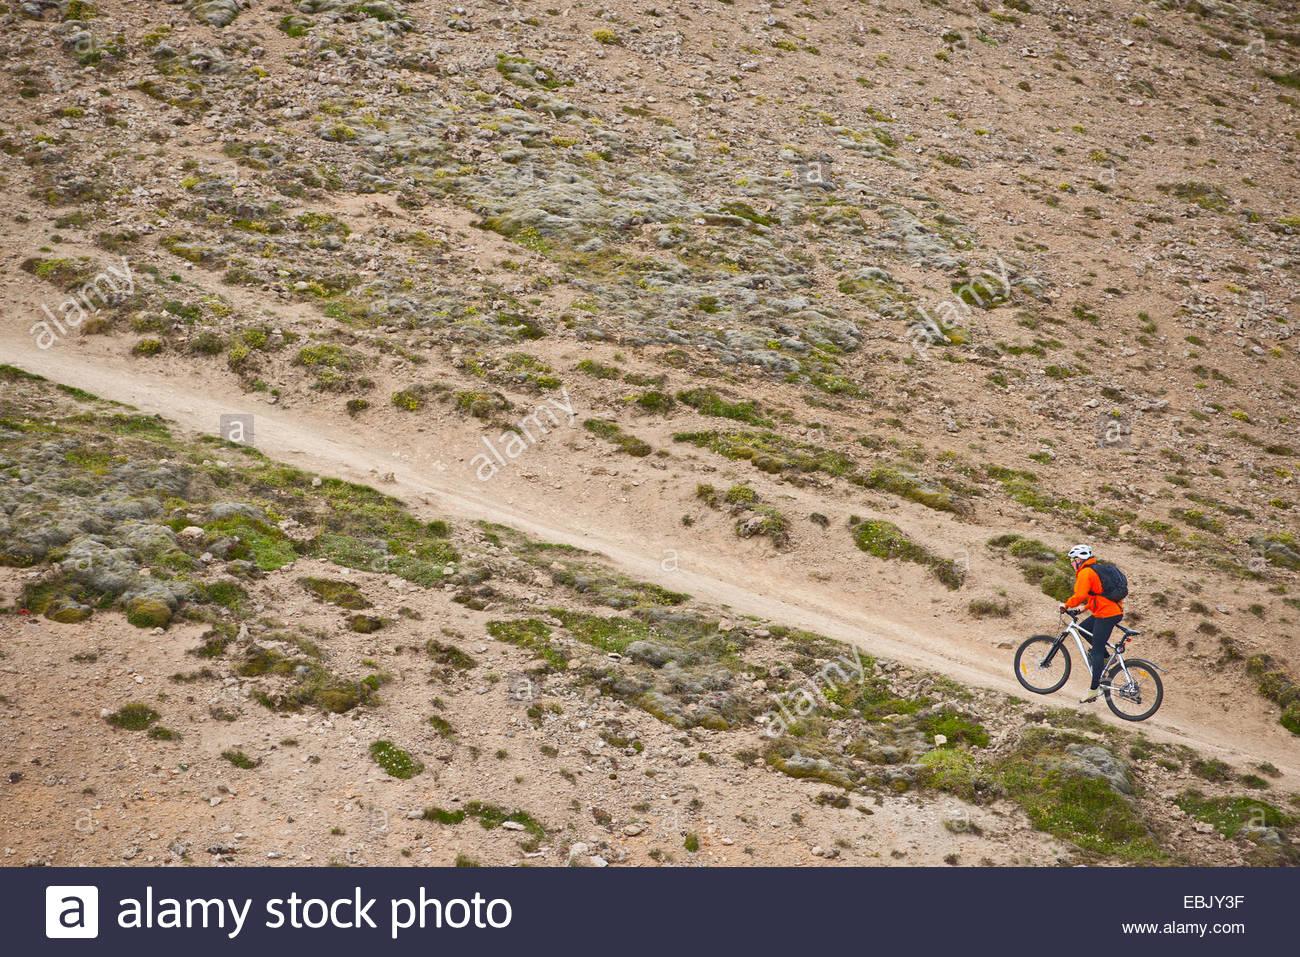 Macho ciclista de montaña en bicicleta de dirt track, empinado valle Reykjadalur, Suroeste de Islandia Imagen De Stock